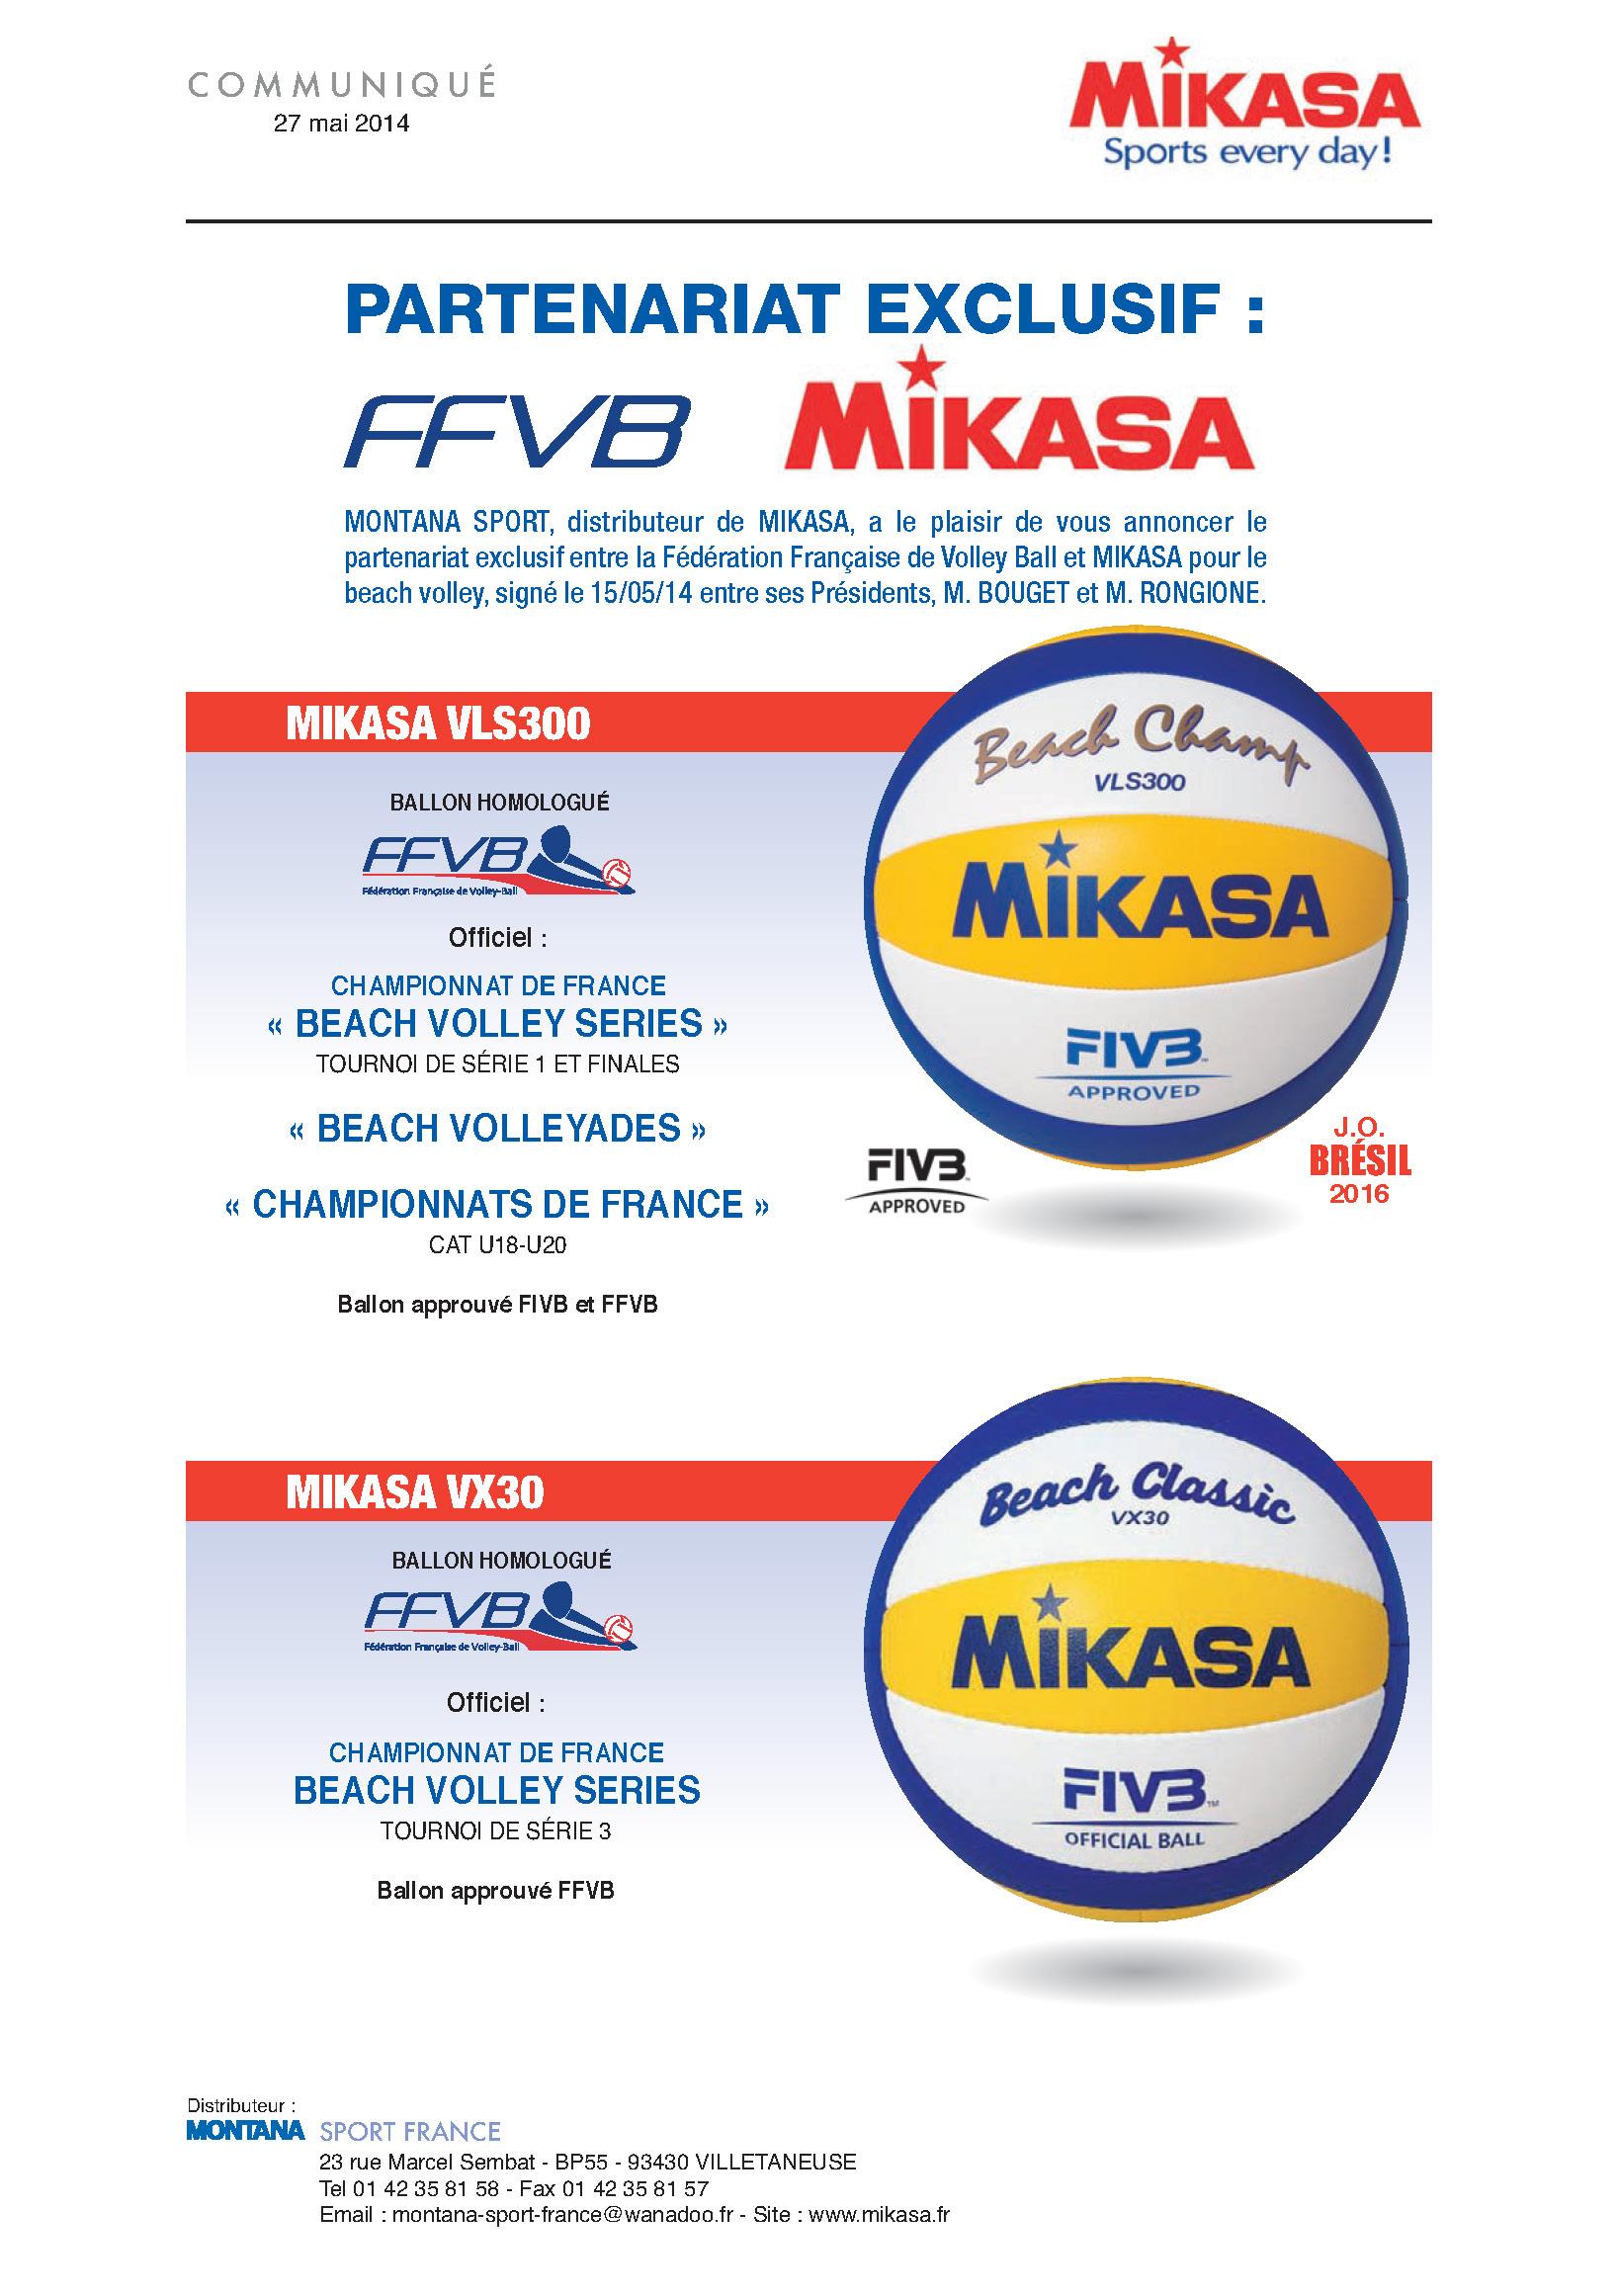 Partenariat exclusif MONTANA MIKASA et FFVB